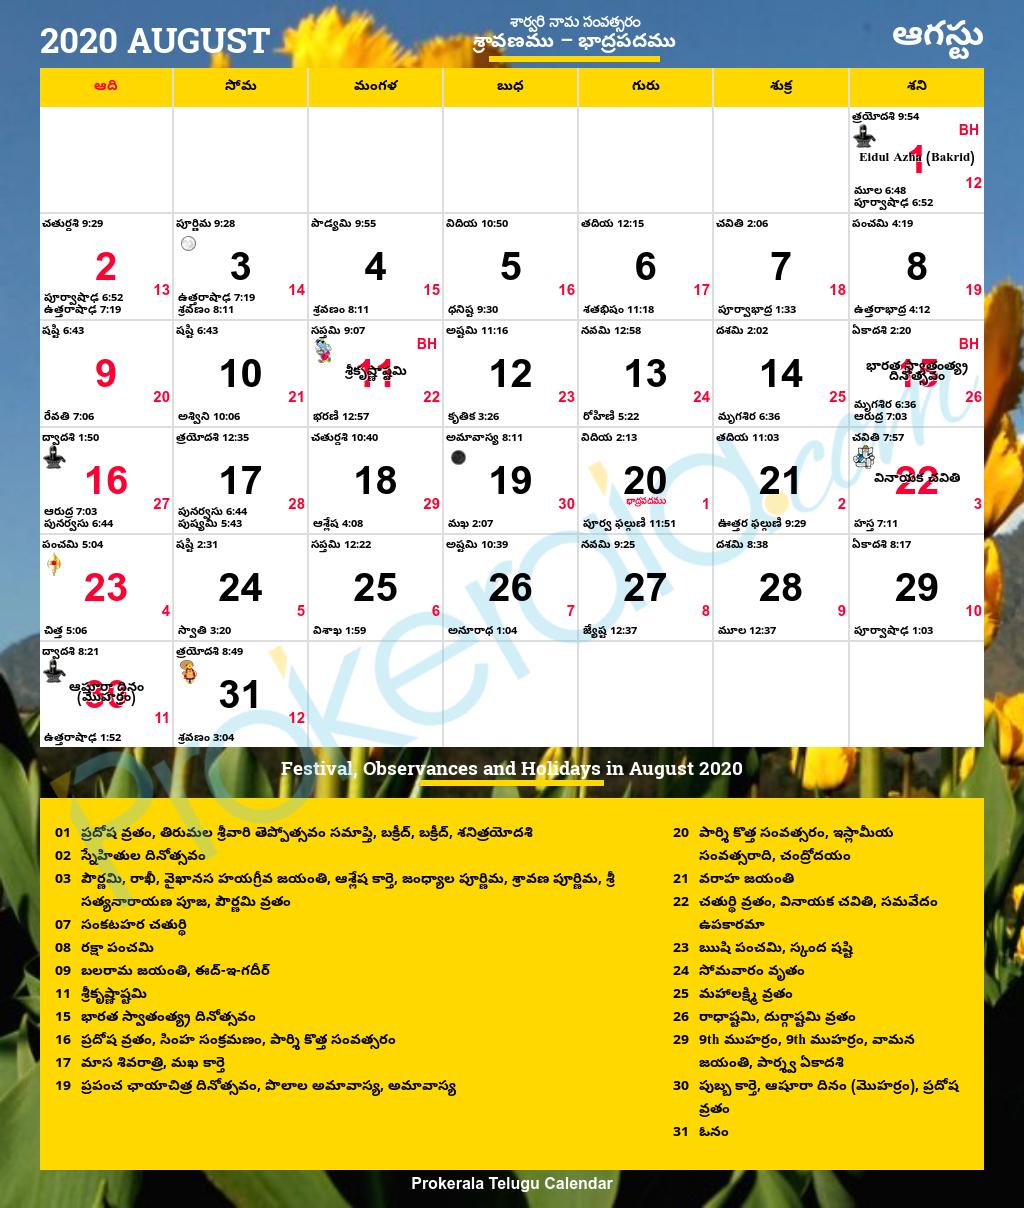 Telugu Calendar 2020, August within Kannada Calendar 2020 August